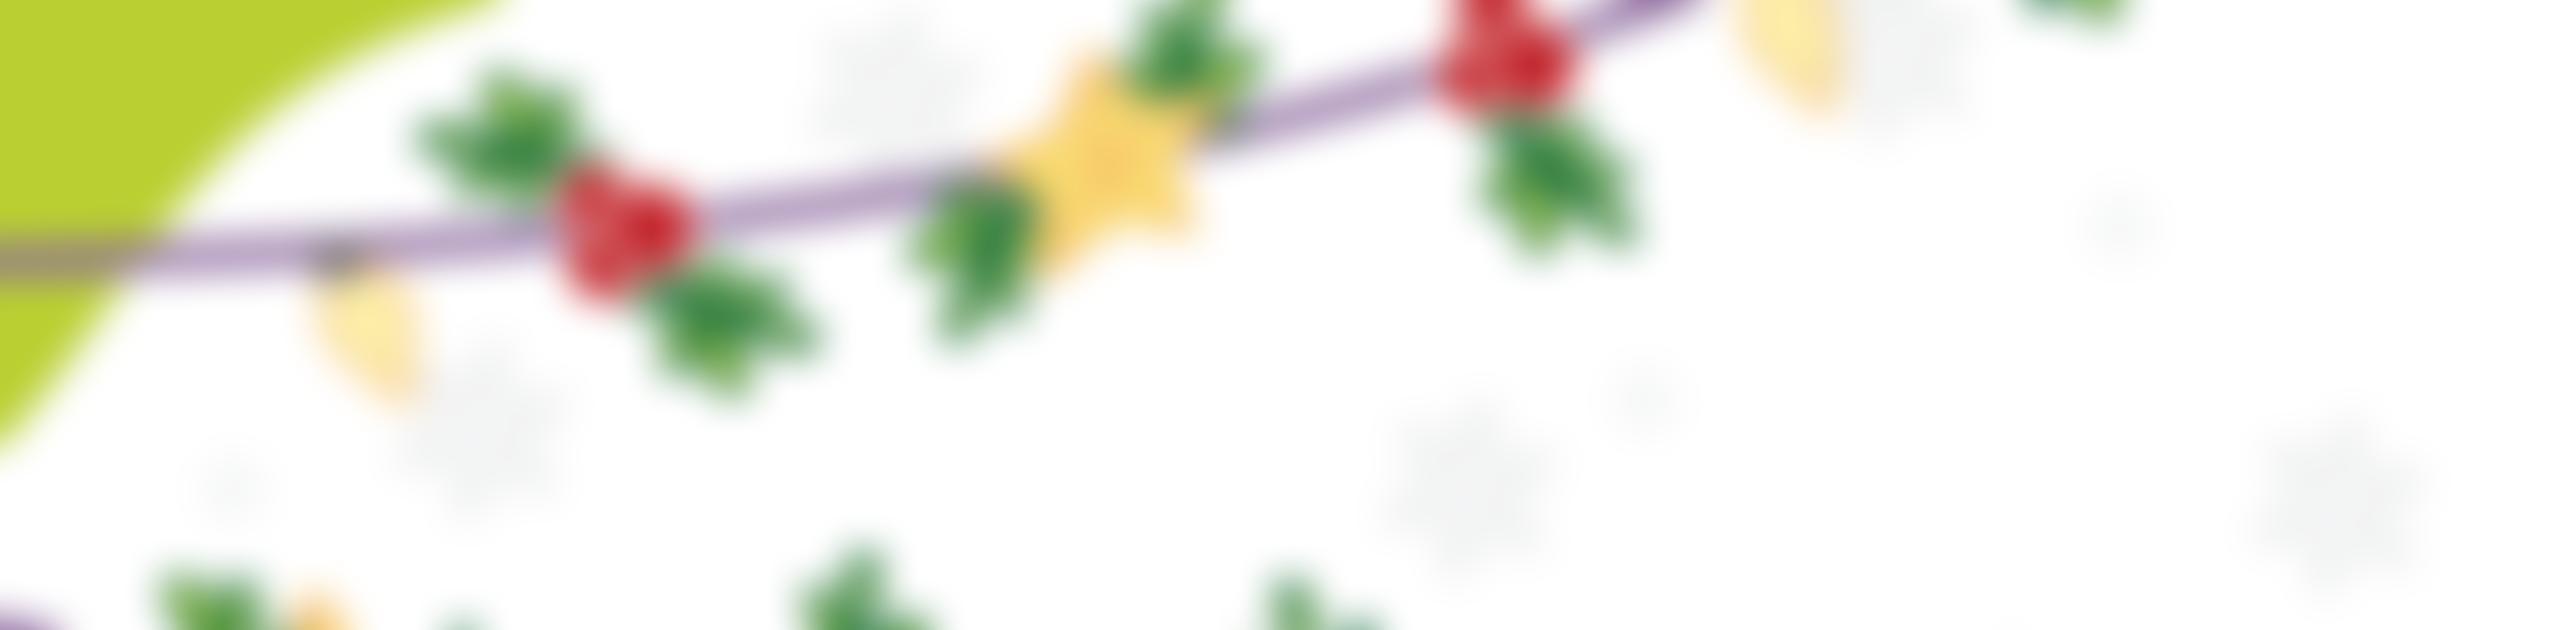 Door 12 - #SDsanta - The SDN Advent Calendar